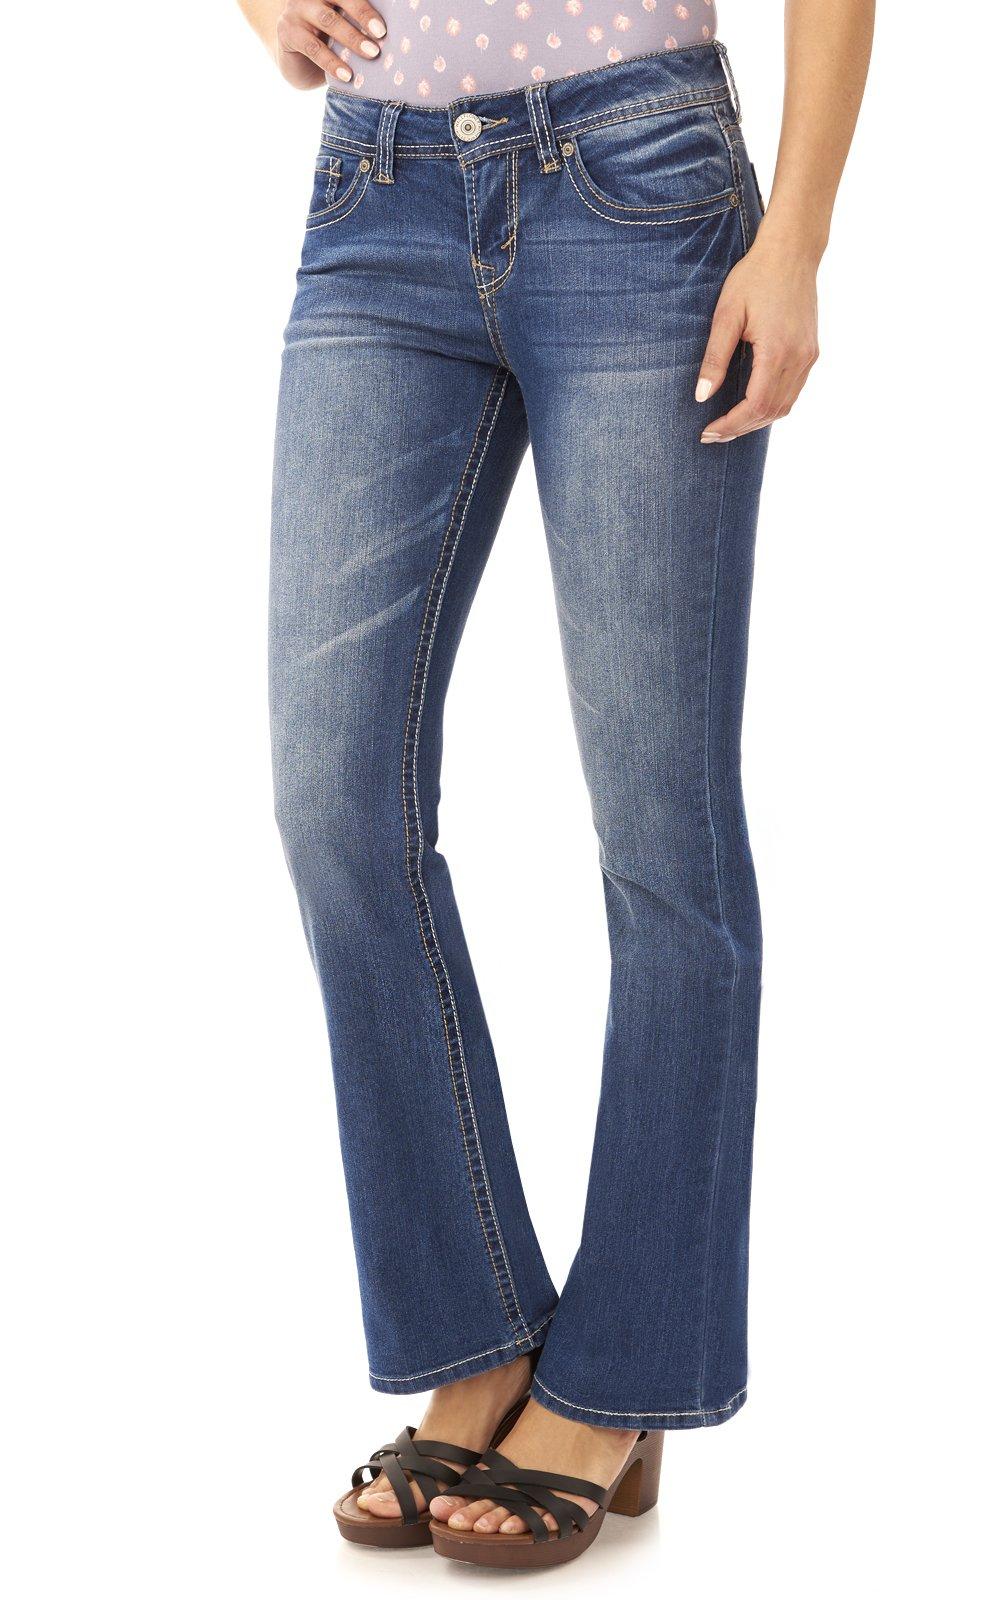 WallFlower Women's Juniors Basic Legendary Bootcut Jeans in Kristen Size: 11 Long